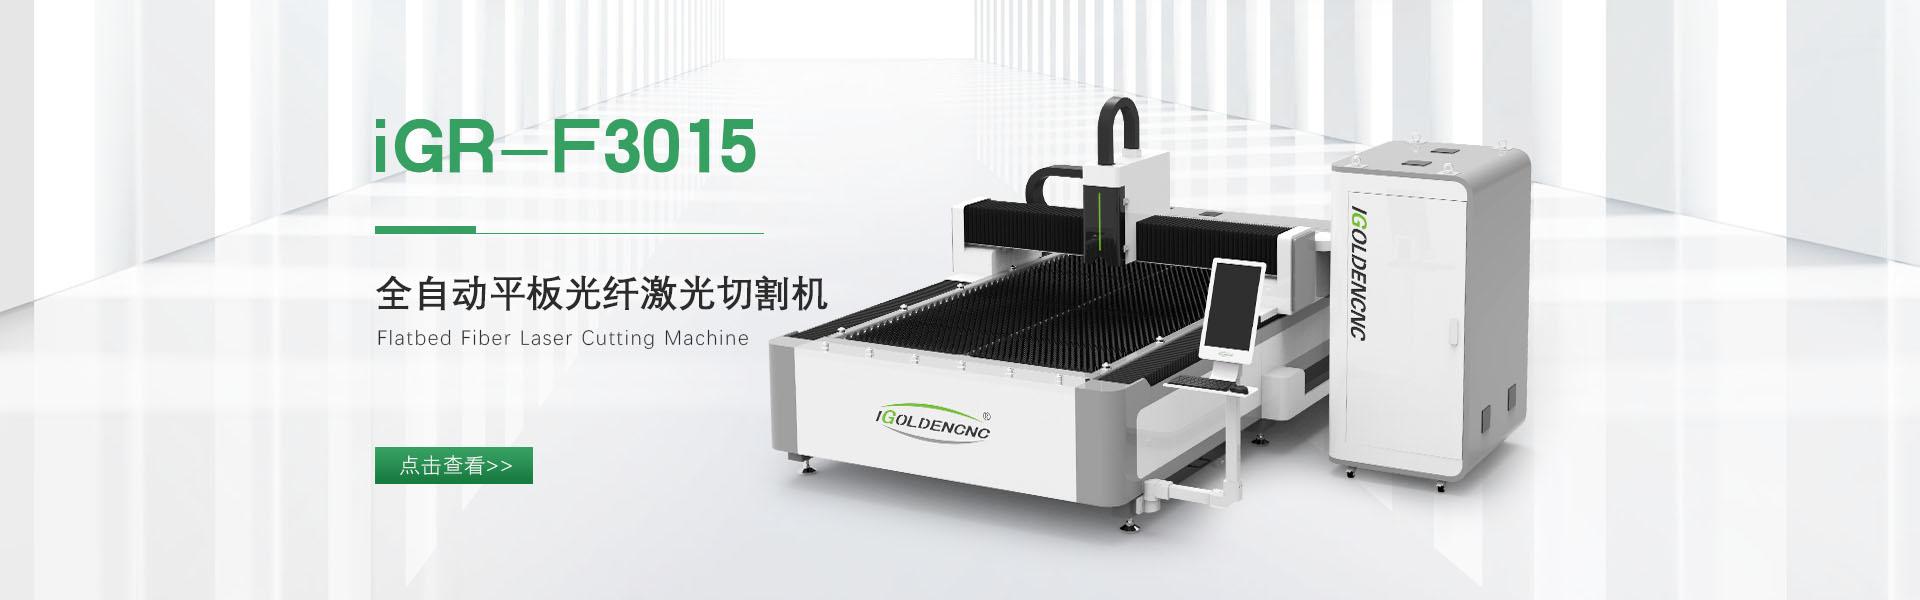 IGR-F3015光纤激光切割机